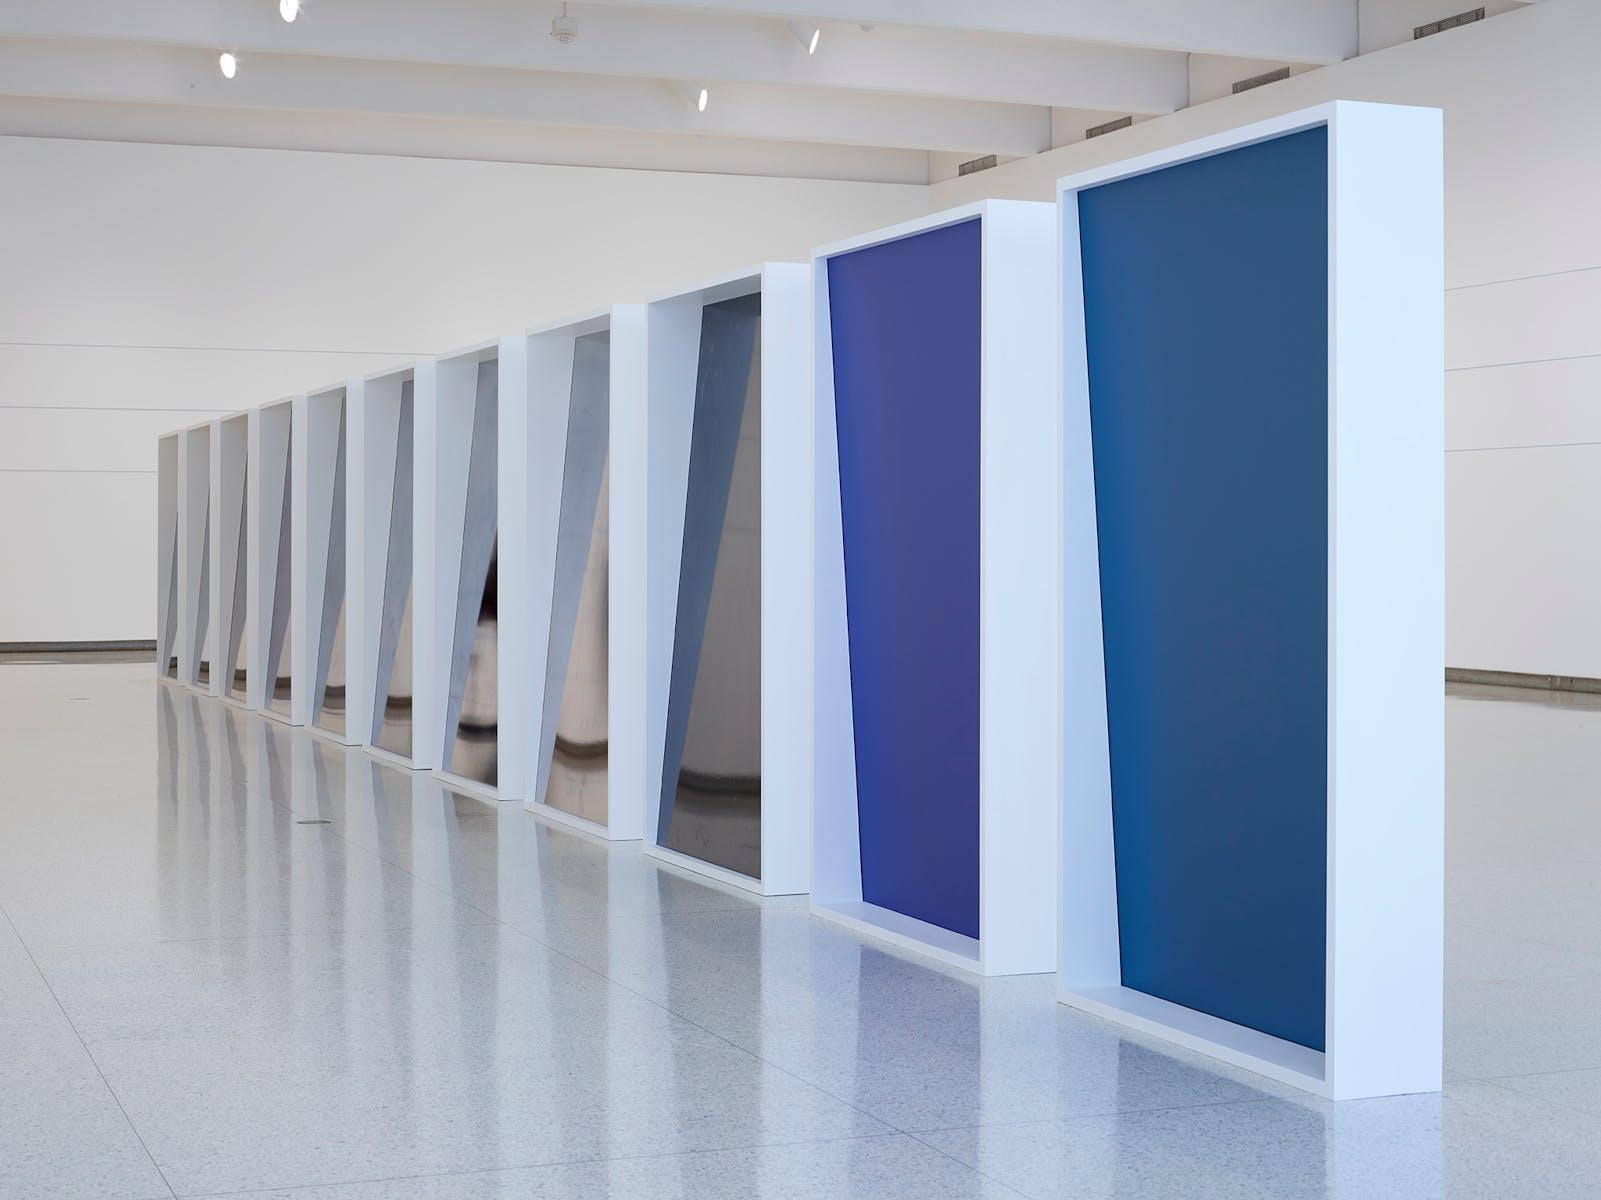 Liz Deschenes, Gallery 7, 2015